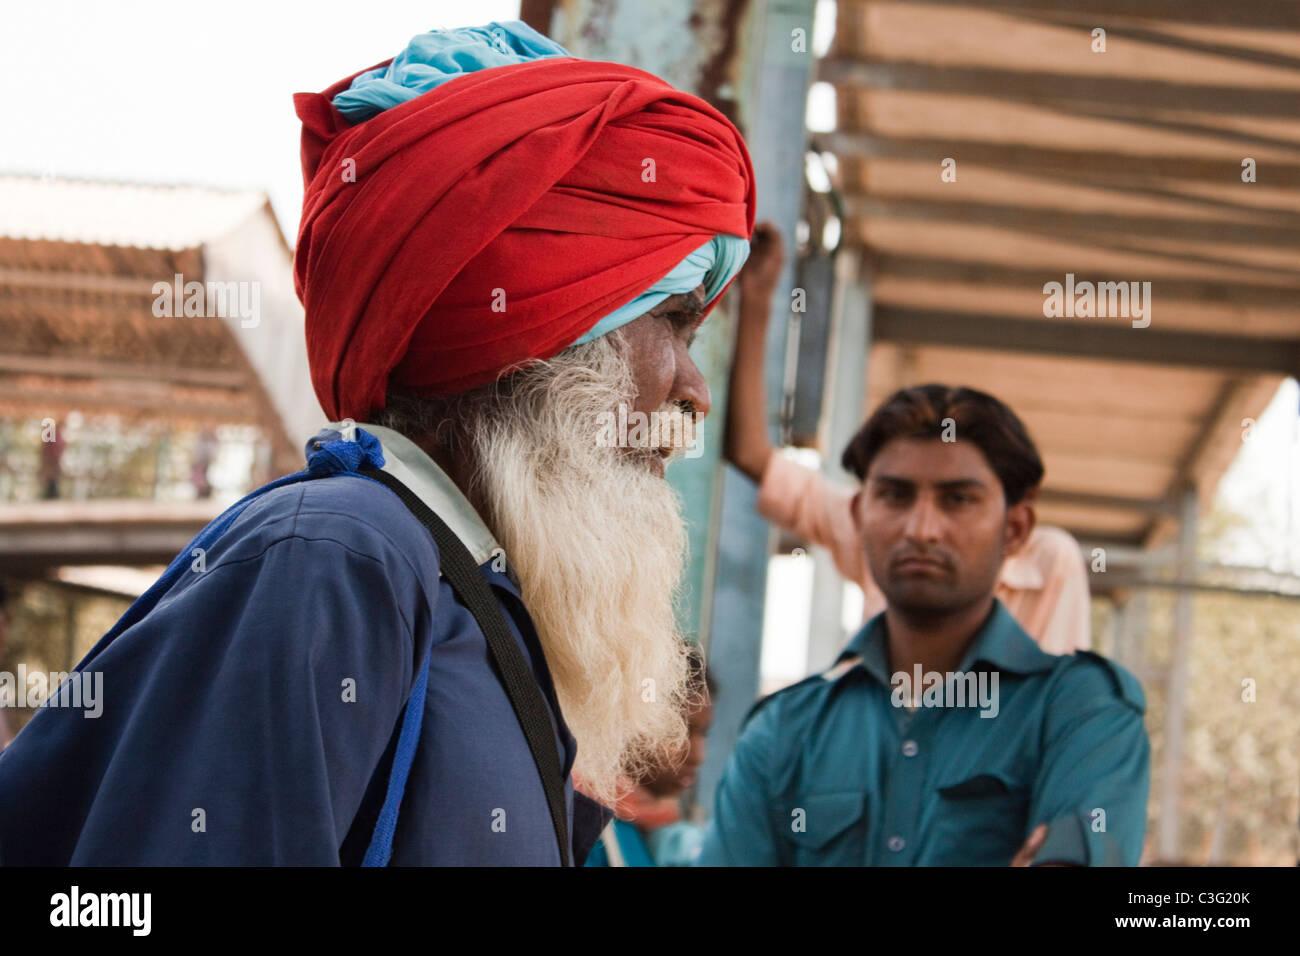 People at a railway station, Ahmedabad, Gujarat, India - Stock Image